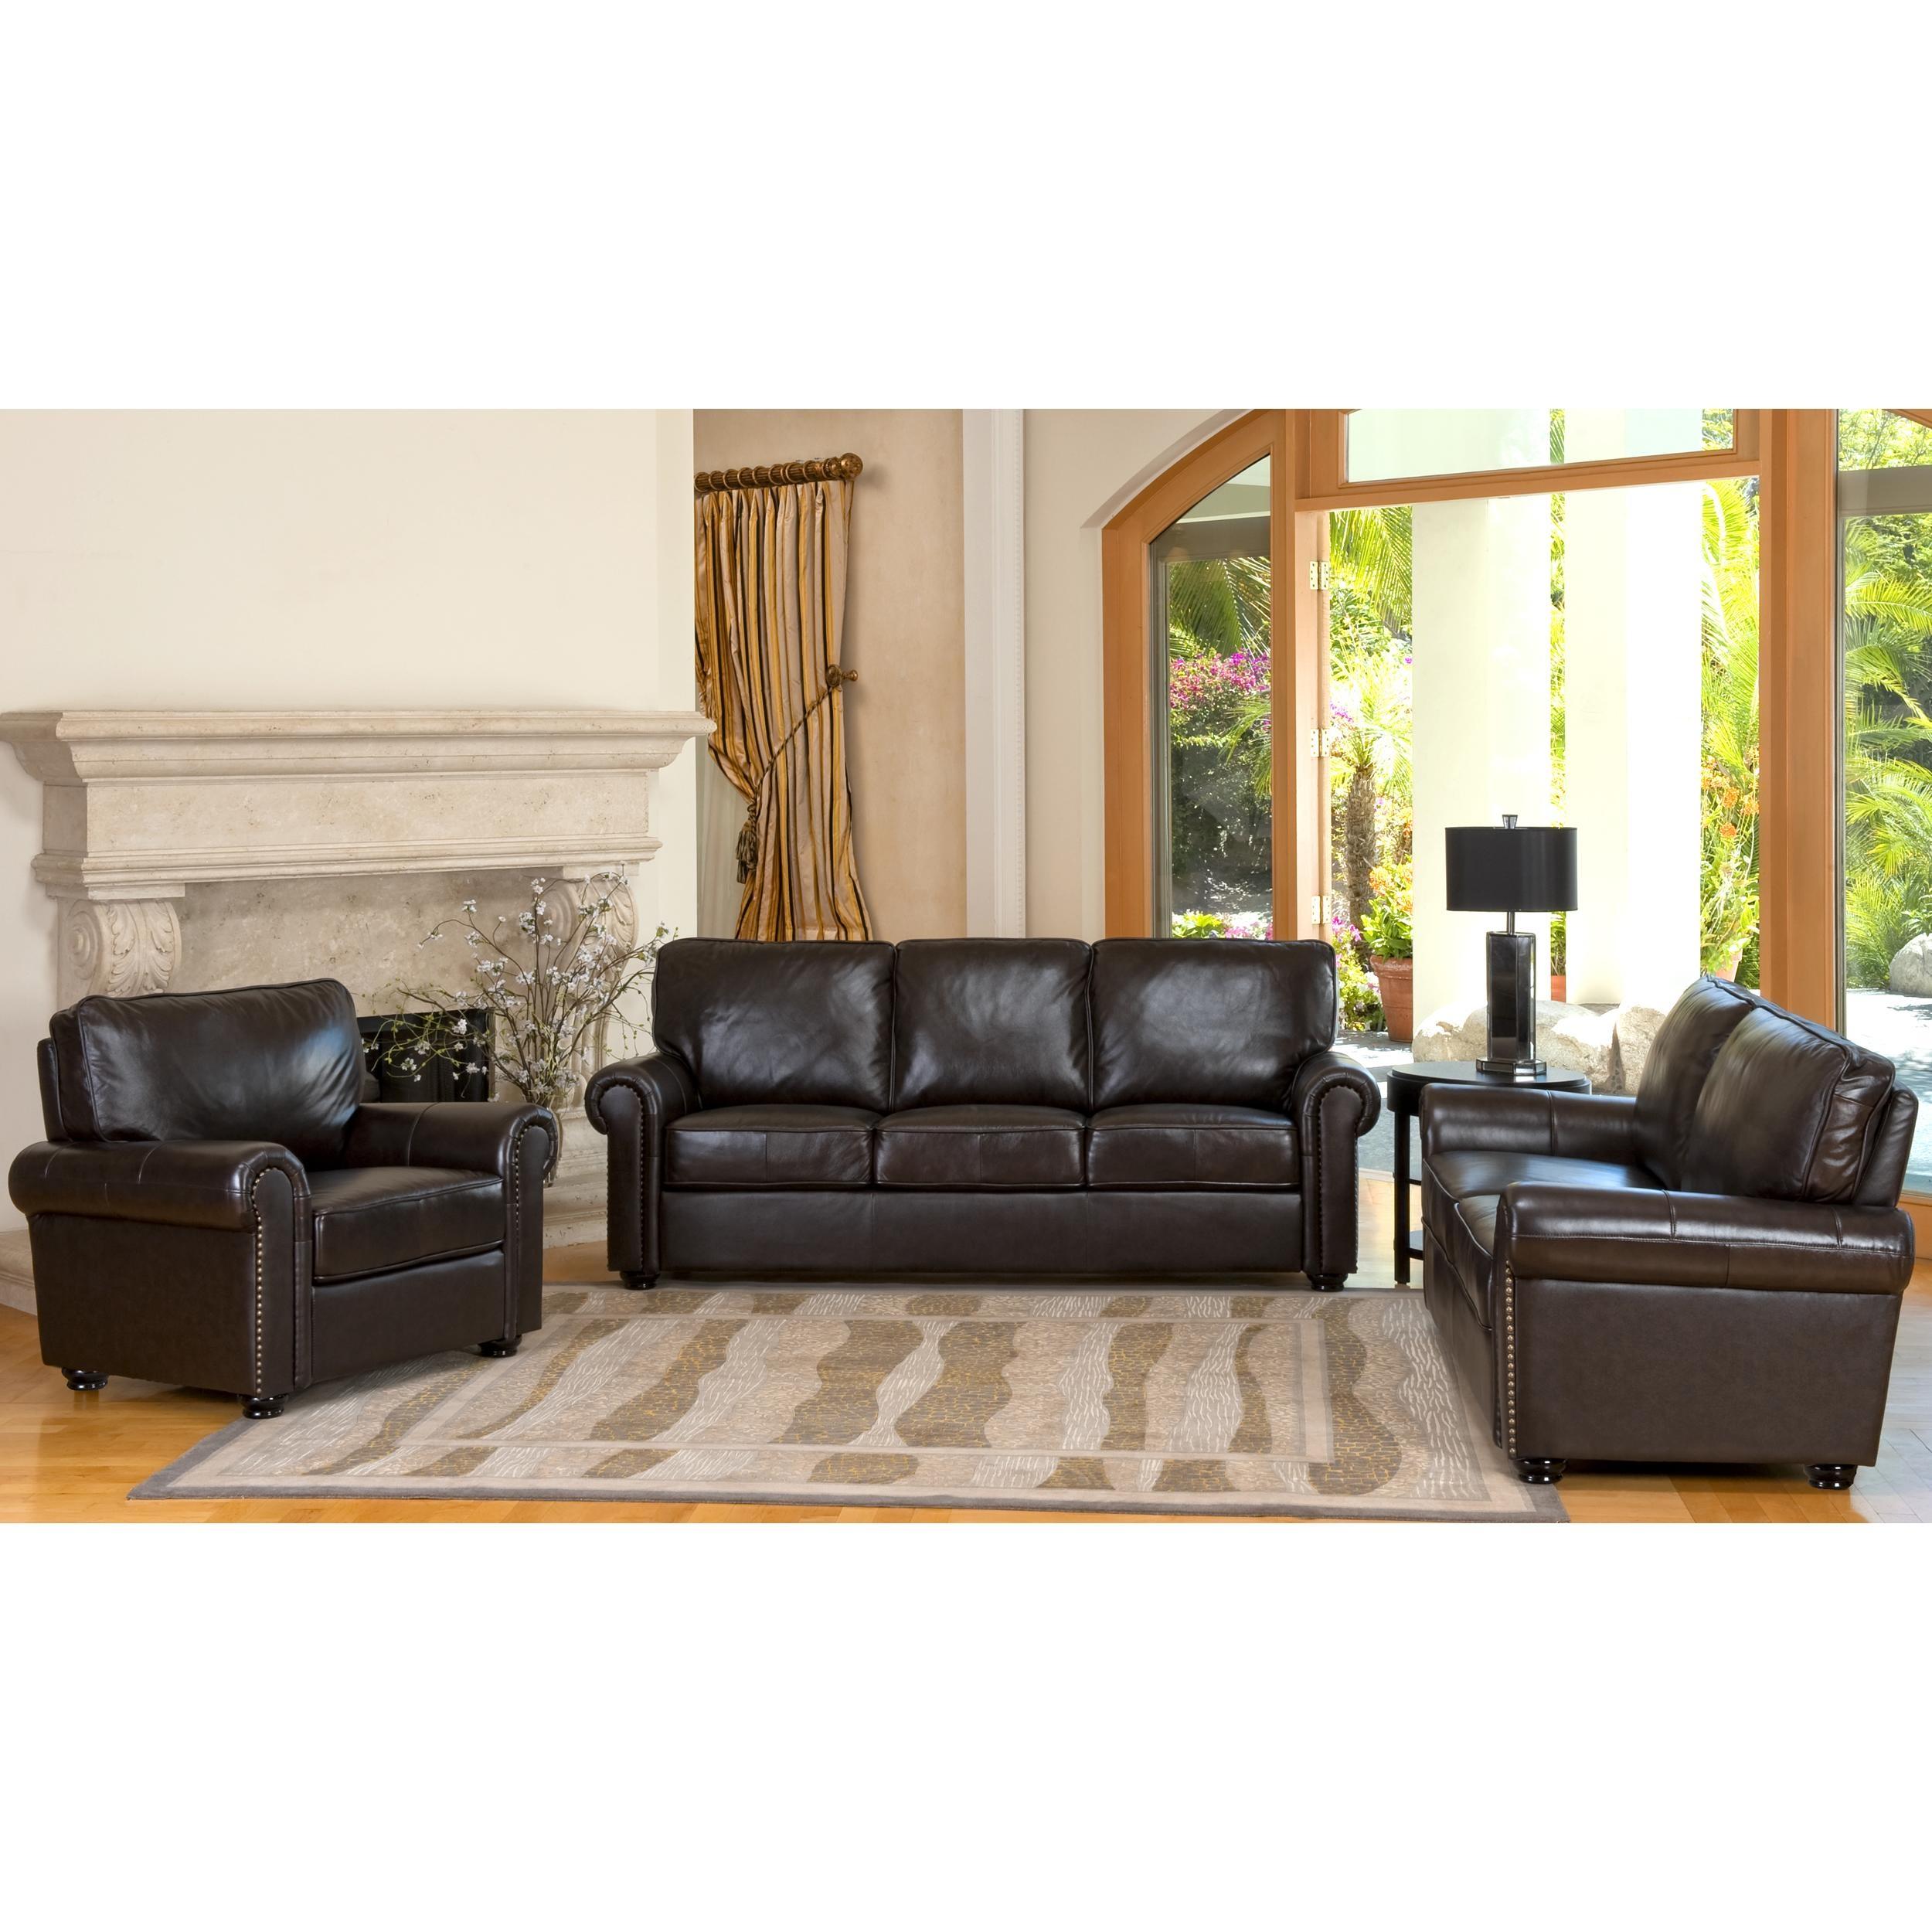 Sofas Center : 42 Excellent Abbyson Living Sofa Photo Concept Pertaining To Abbyson Living Sofas (Image 14 of 20)